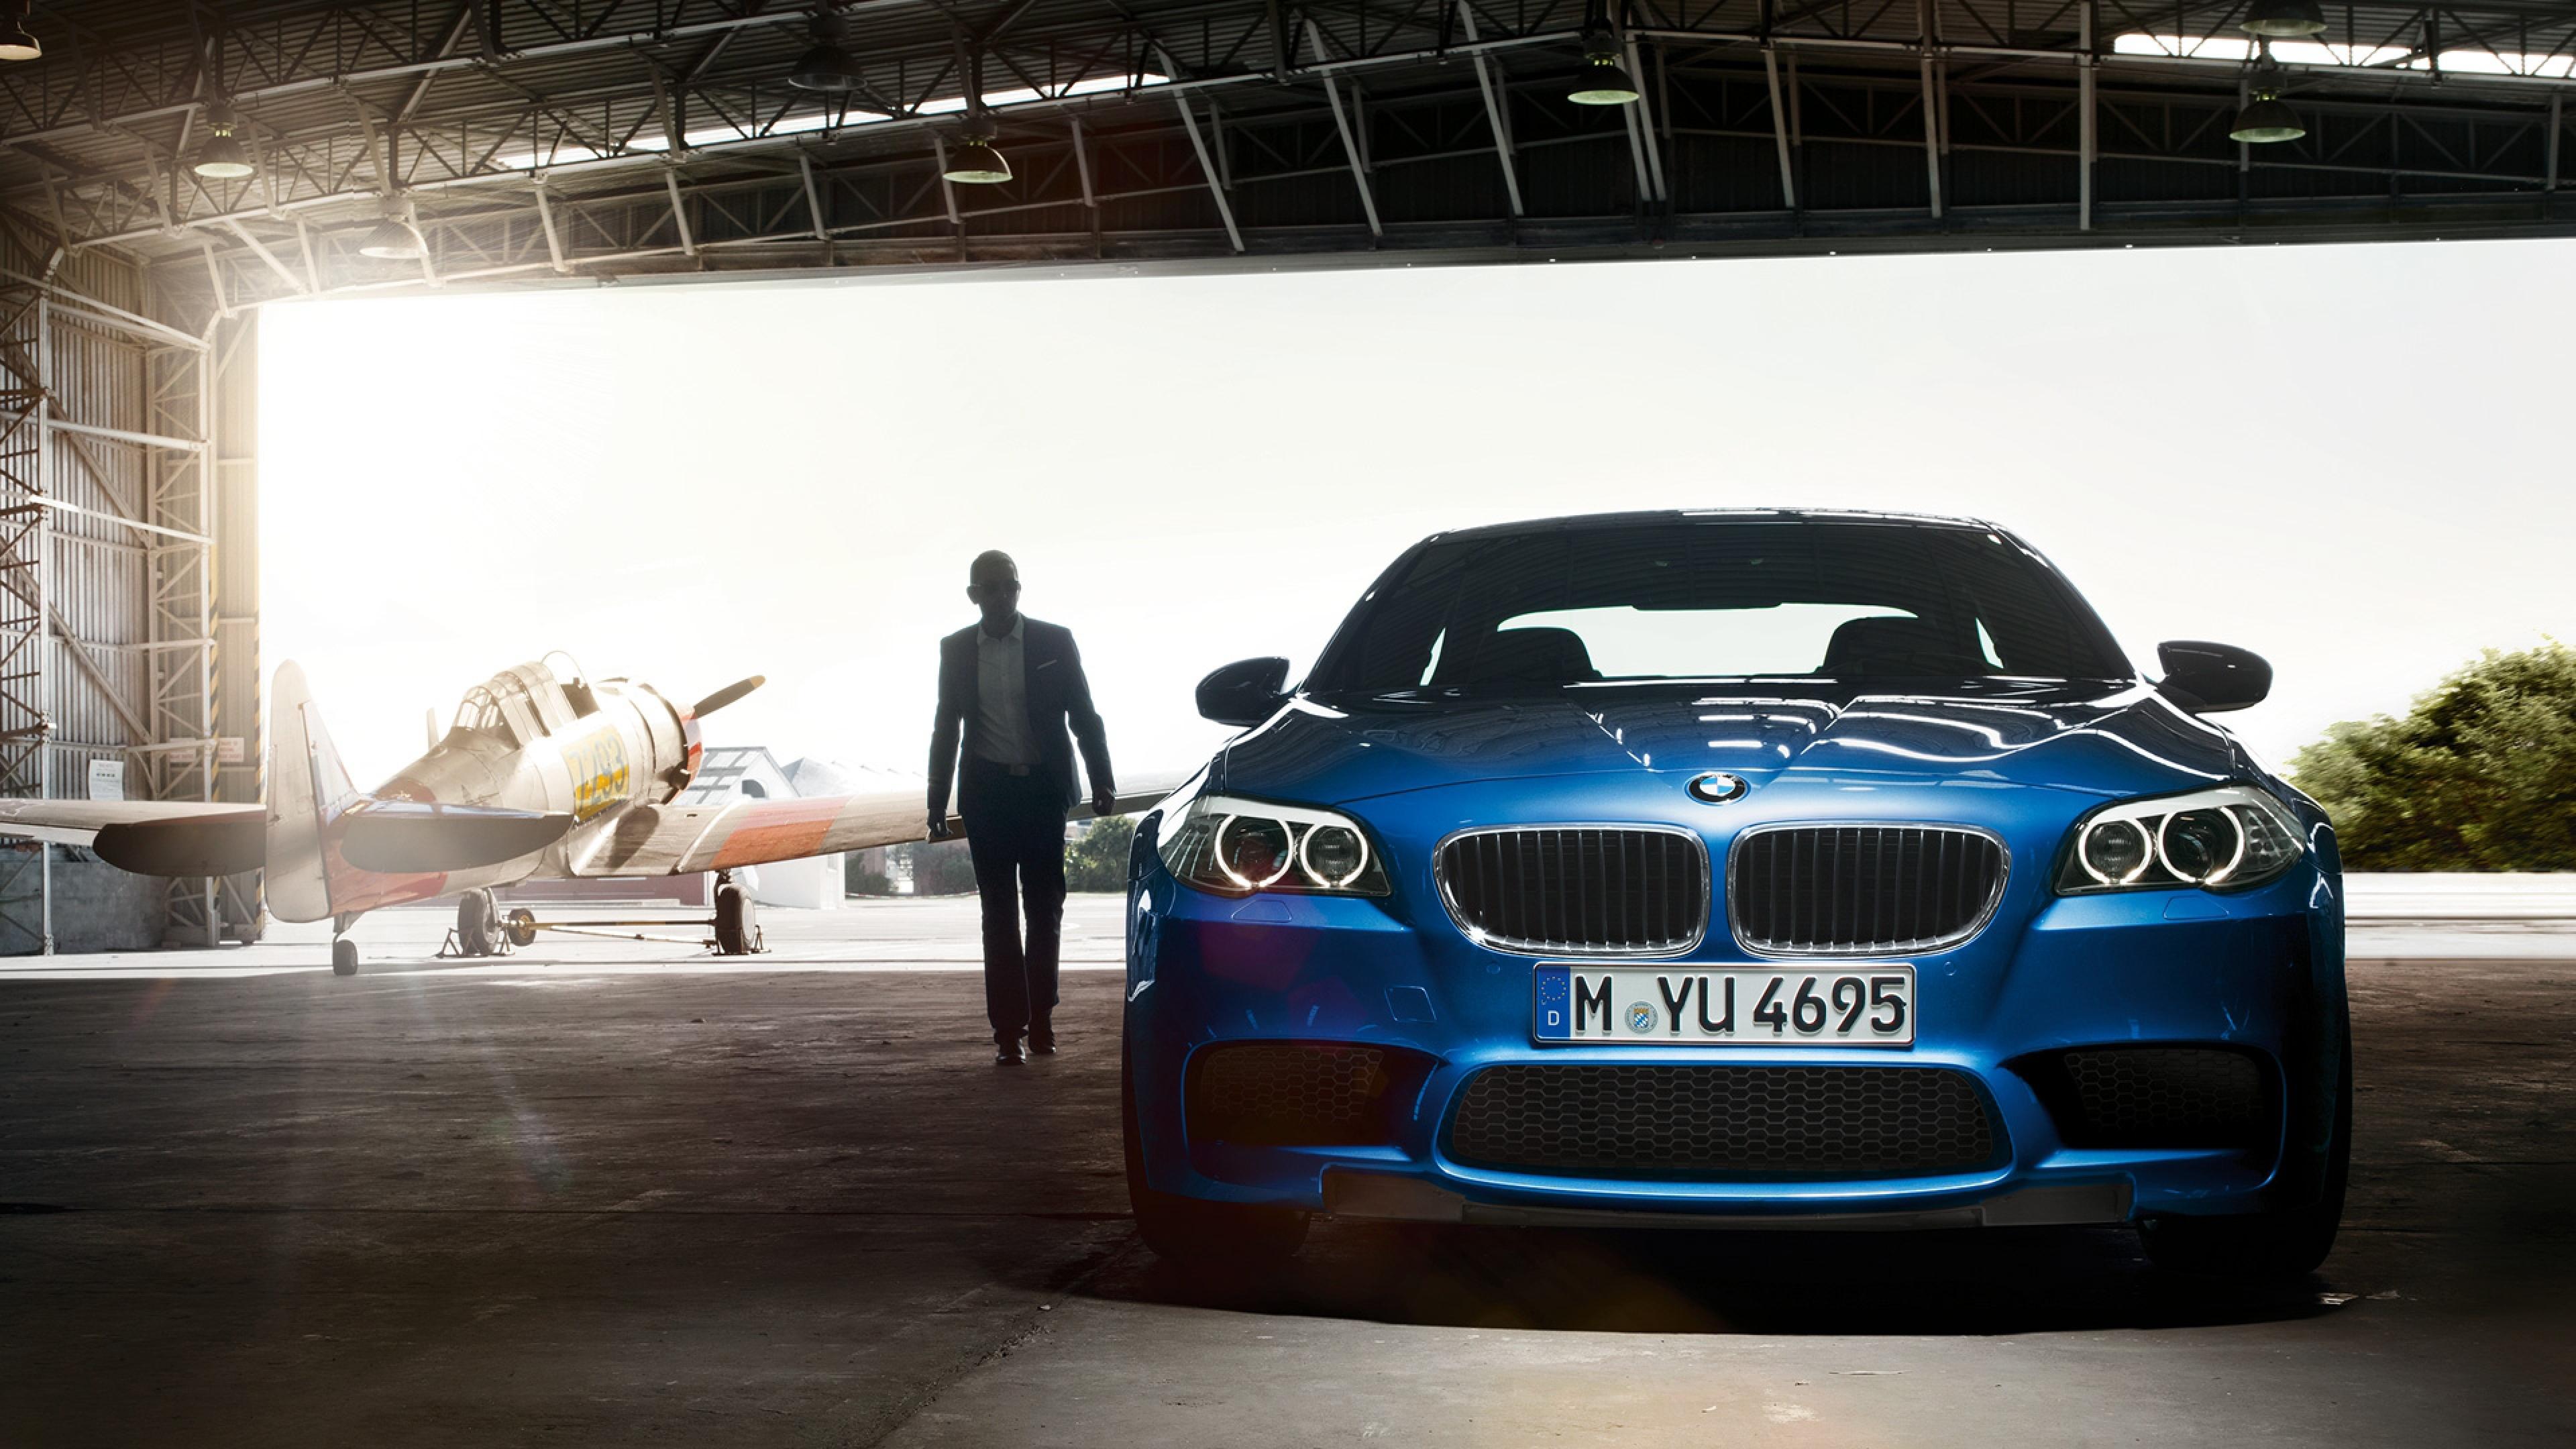 Download Wallpaper 3840x2160 bmw m5 car 4K Ultra HD HD Background 3840x2160